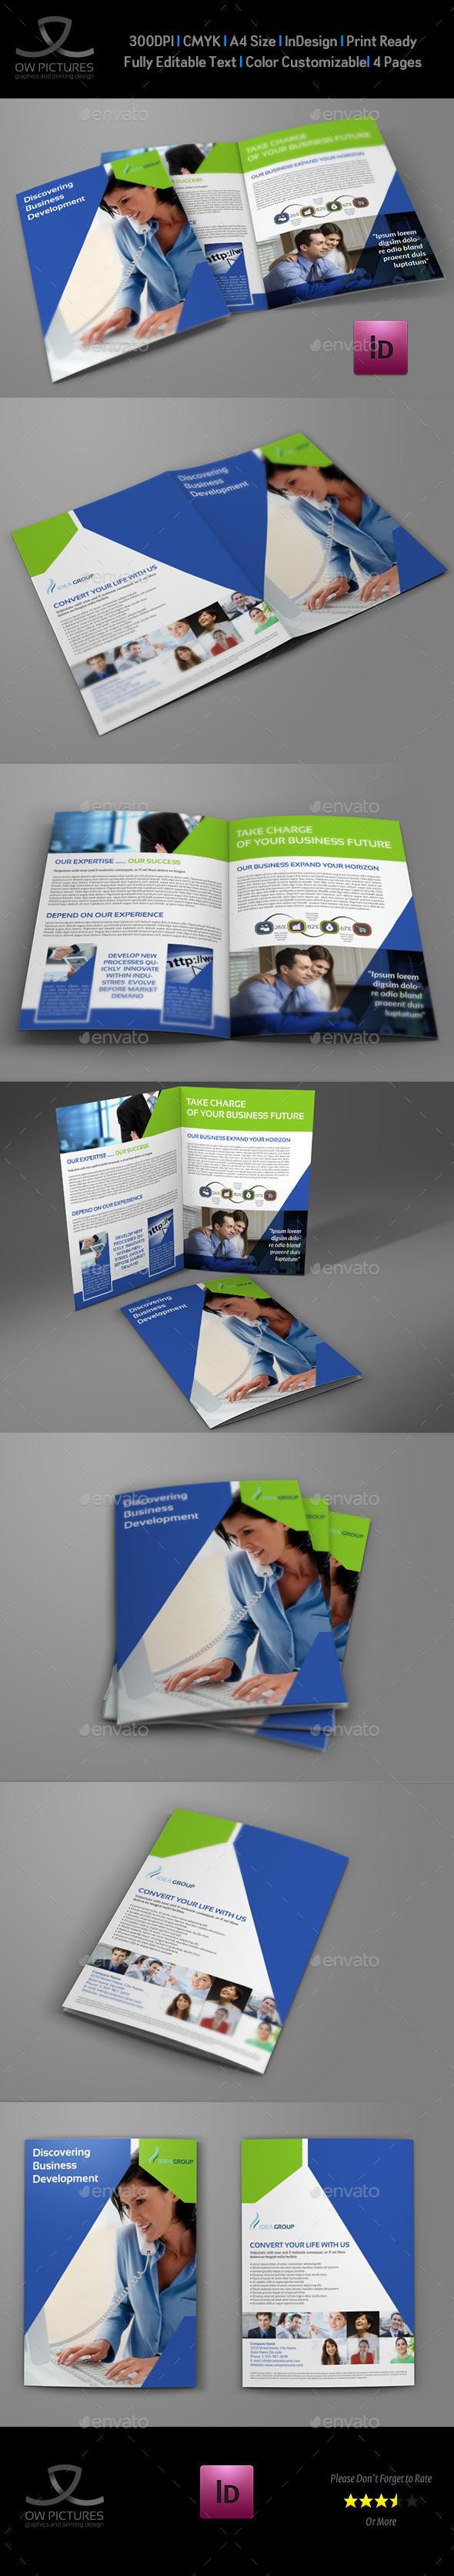 Company Brochure Bi-Fold Template Vol.32 - Corporate Brochures